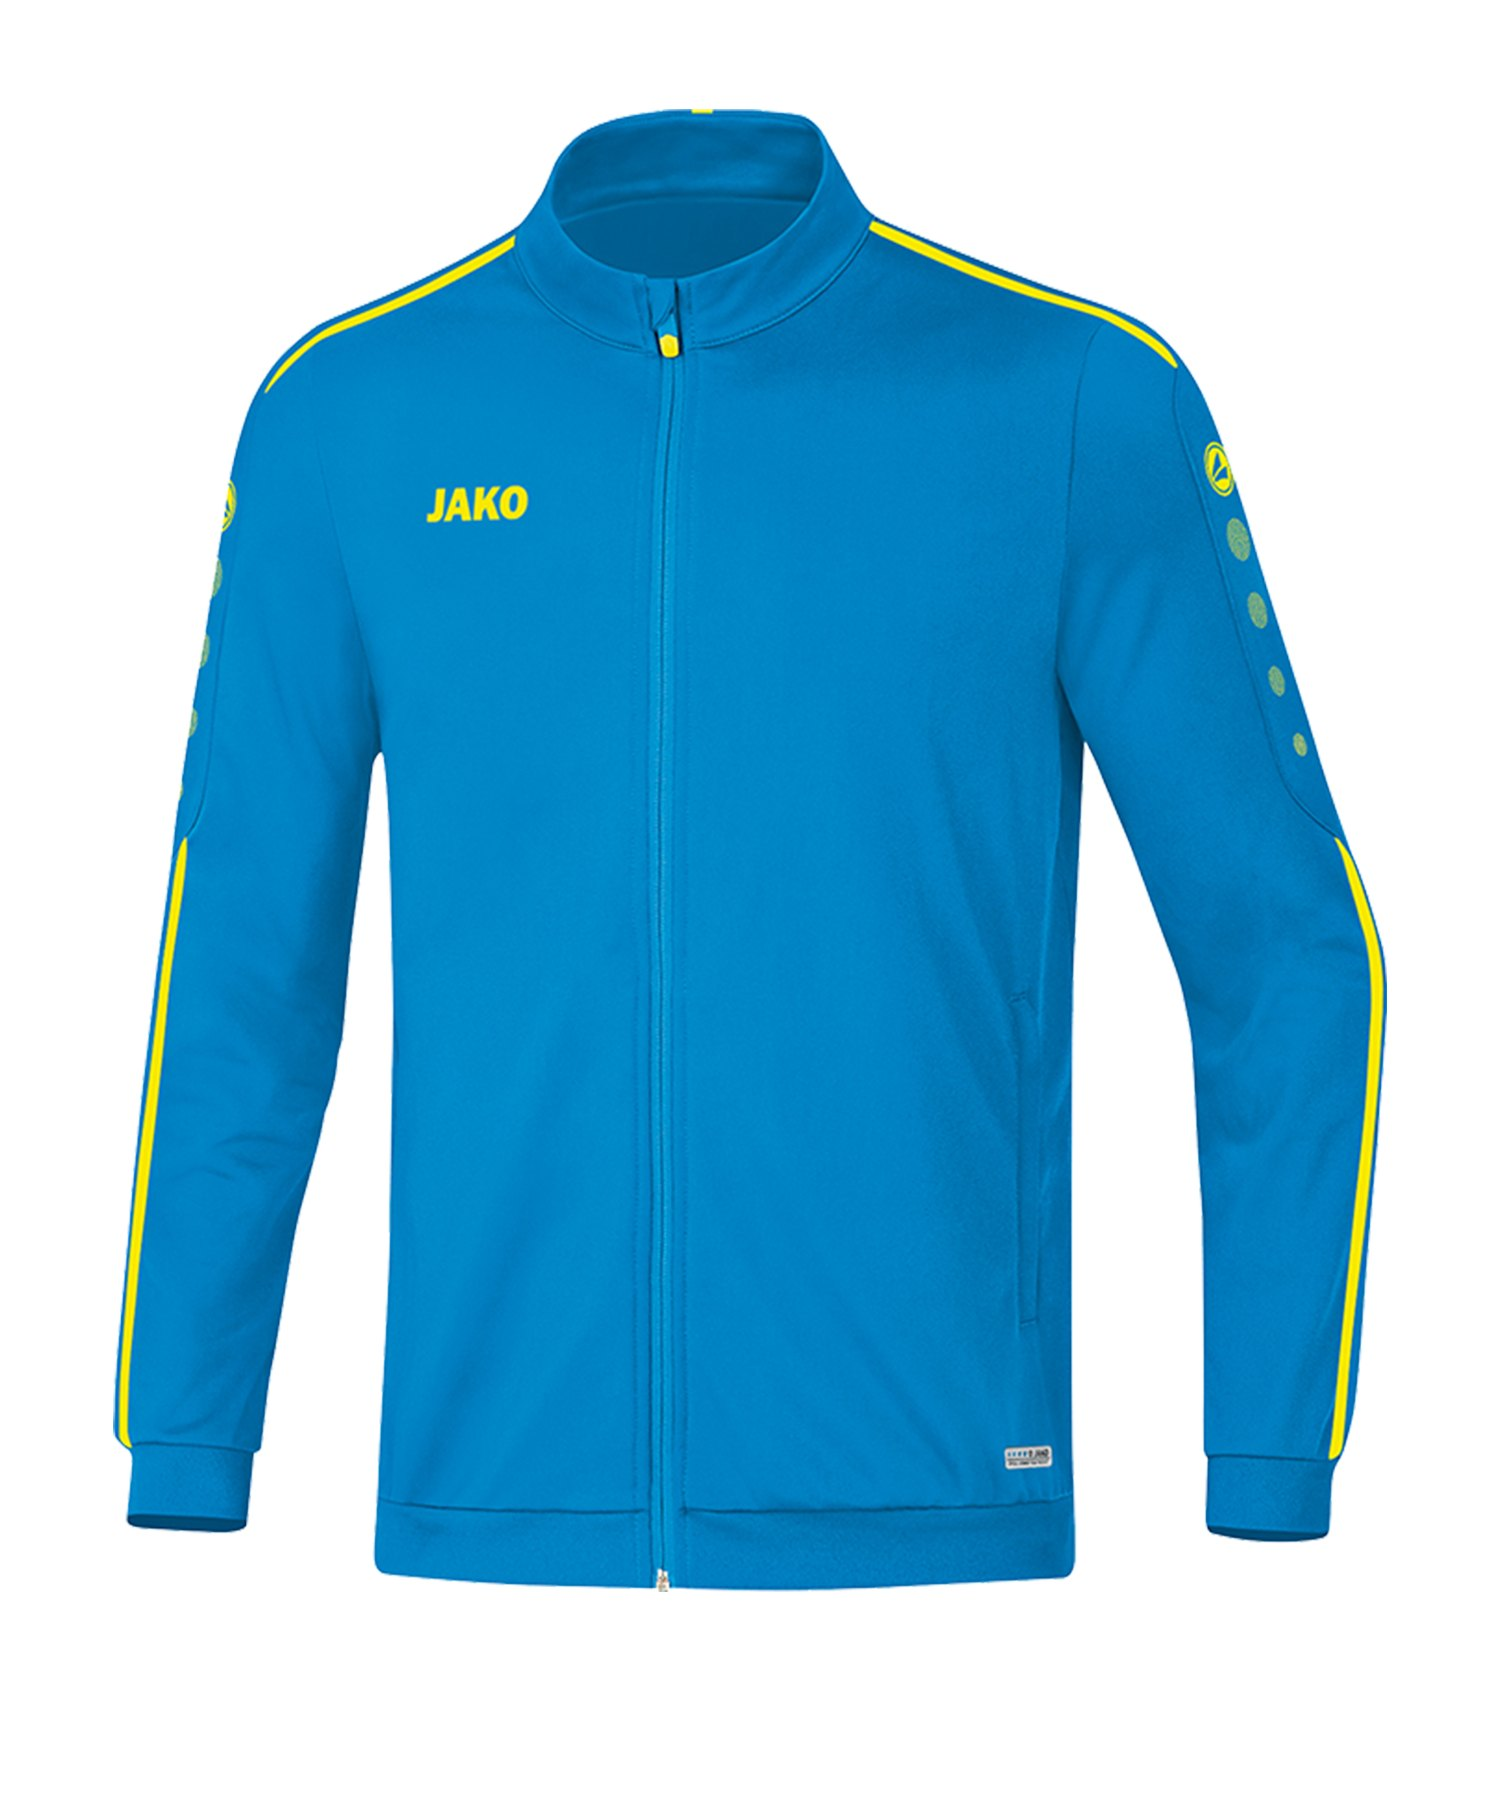 Jako Striker 2.0 Polyesterjacke Blau Gelb F89 - Blau